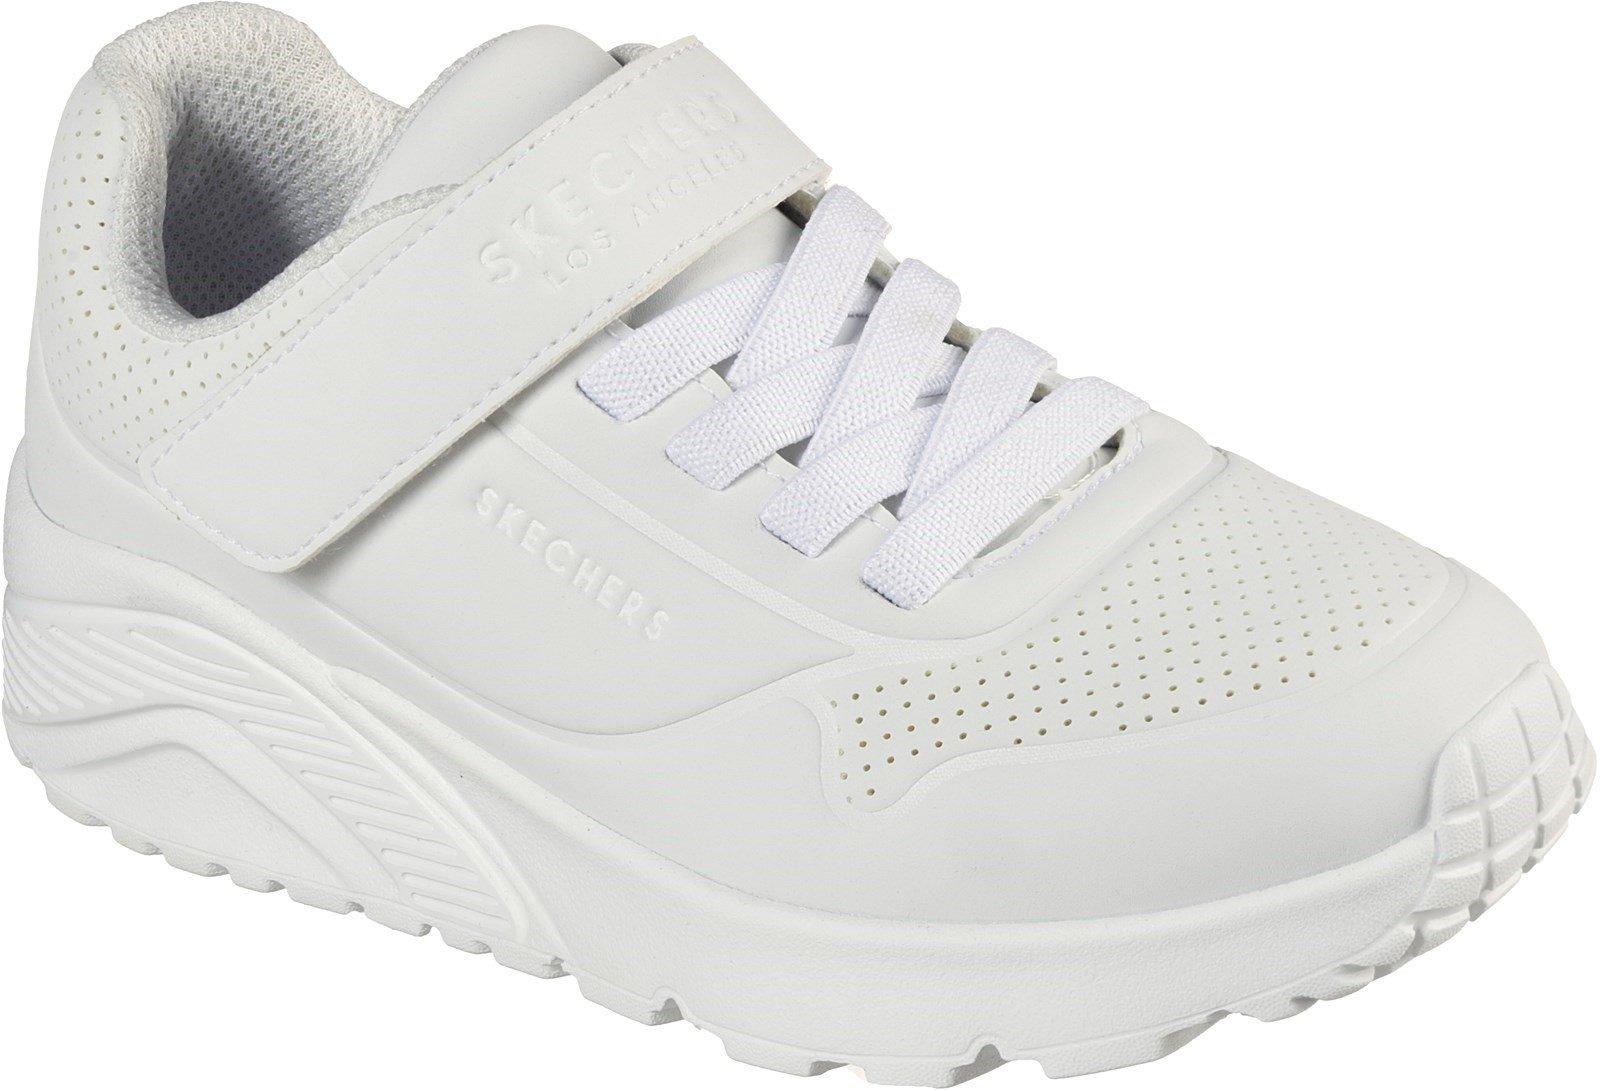 Skechers Kid's Uno Lite Vendox School Trainer Various Colours 32518 - White Synthetic & Trim 12.5